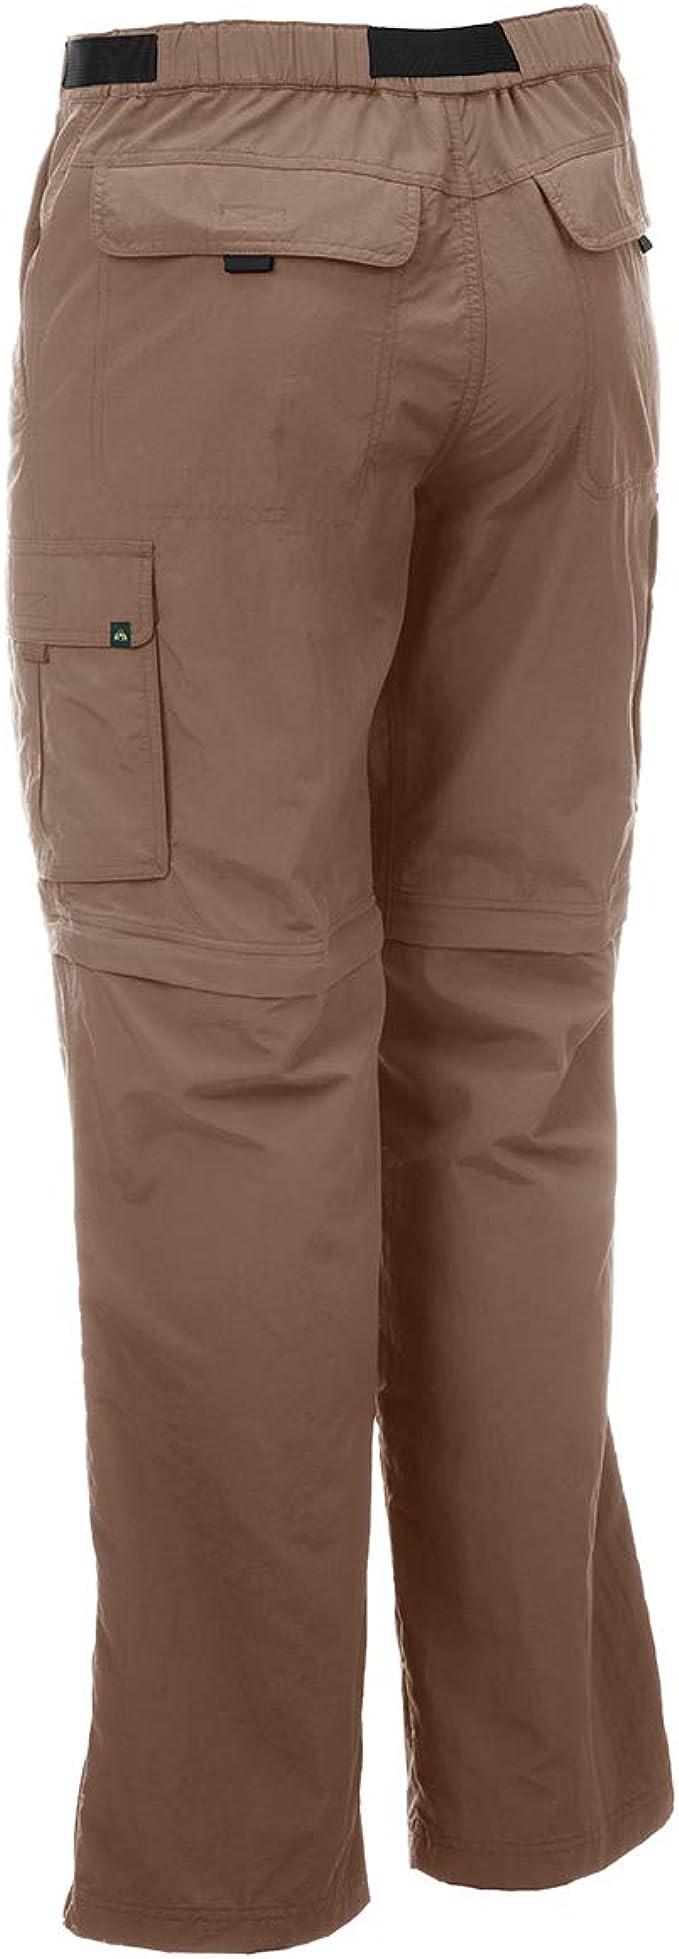 Details about  /Campagnolo CMP Boy Pant Zip-Off Children Trekking Pants Function Pants outdoorhose ghose Funktionshose Outdoorhose data-mtsrclang=en-US href=# onclick=return false; show original title